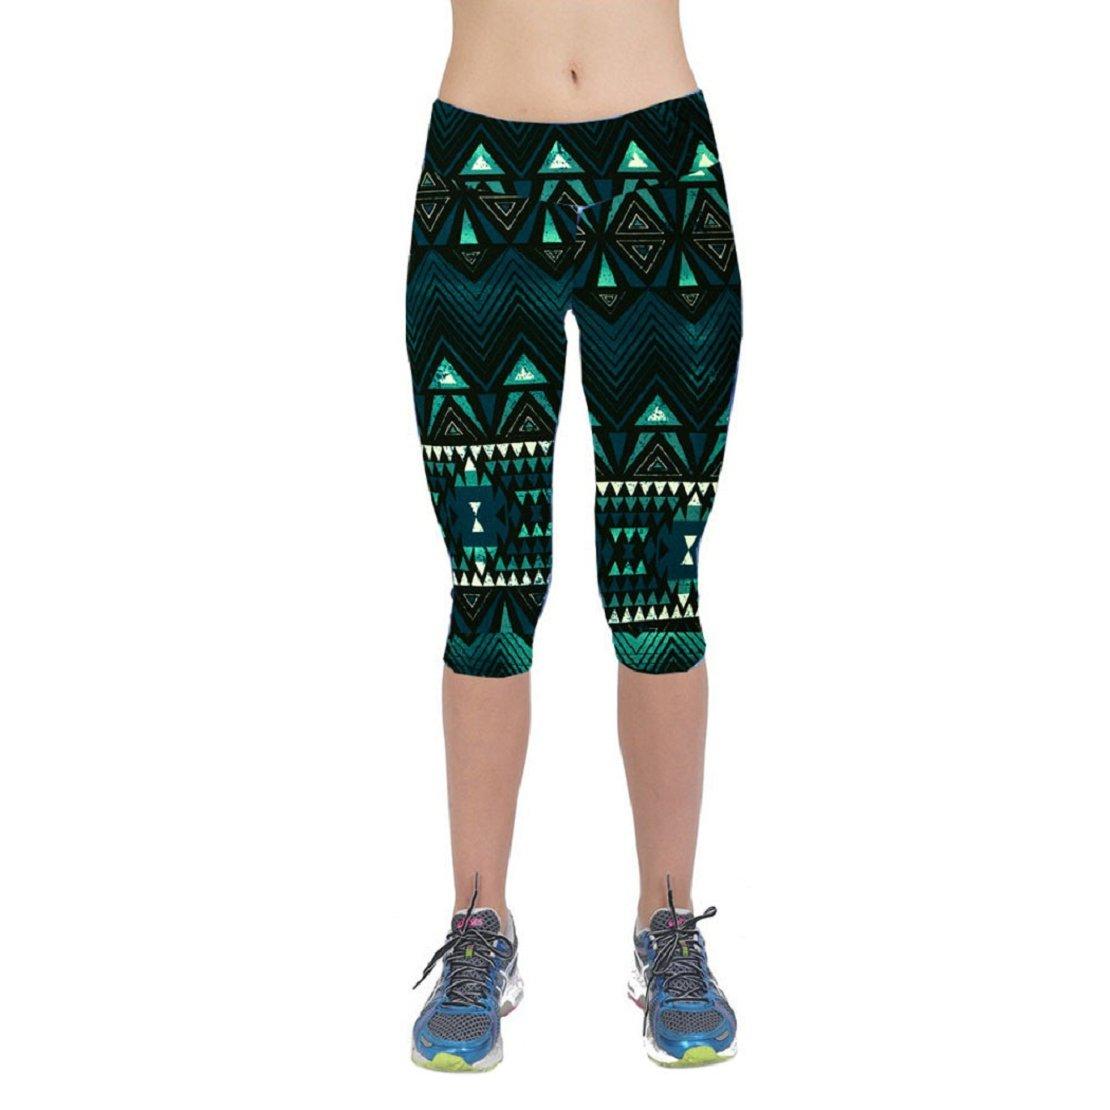 Lookatool Clearance Women's 3D Print Yoga Pants Skinny Workout Gym Leggings